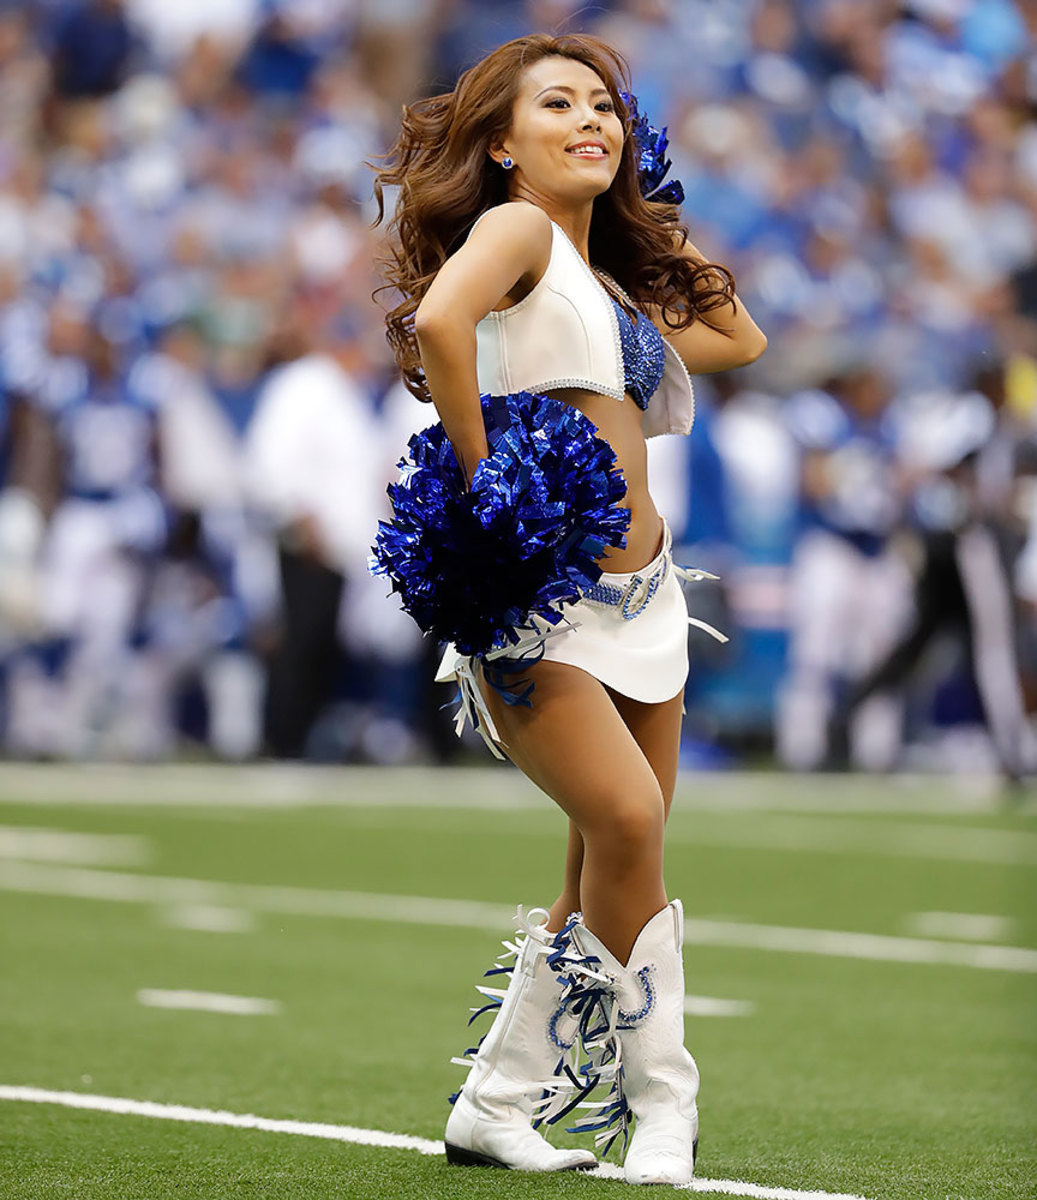 Indianapolis-Colts-cheerleaders-AP_579272407808.jpg